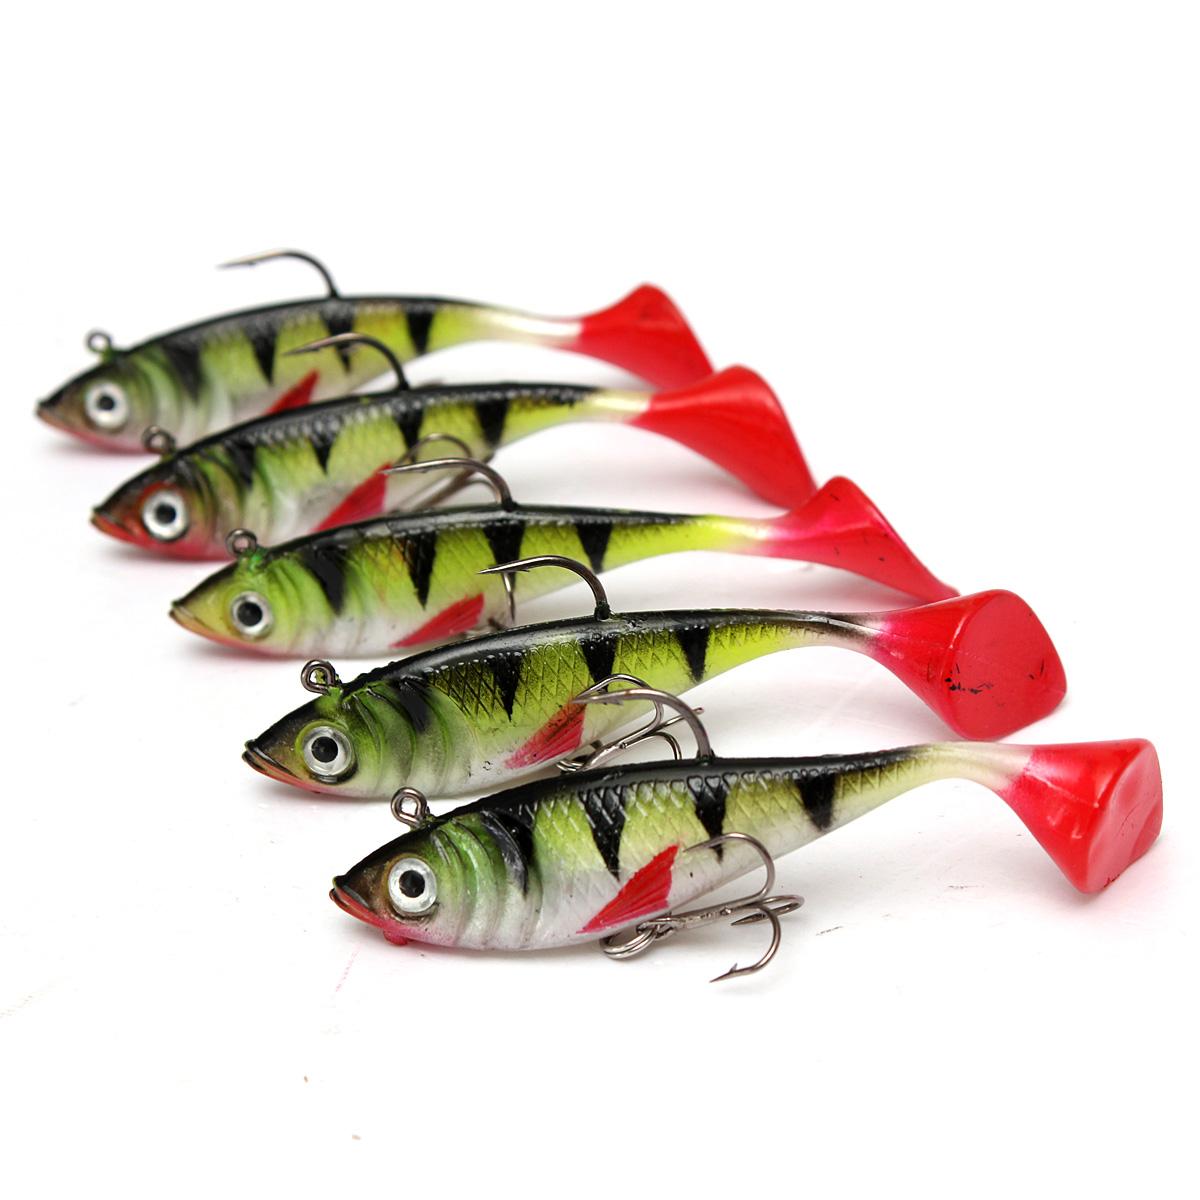 5Pcs 3 34'' Long Tail Soft Lead Fish Fishing Lures Luminous Sea Fishing  Tackle Soft Bait Bass Hook